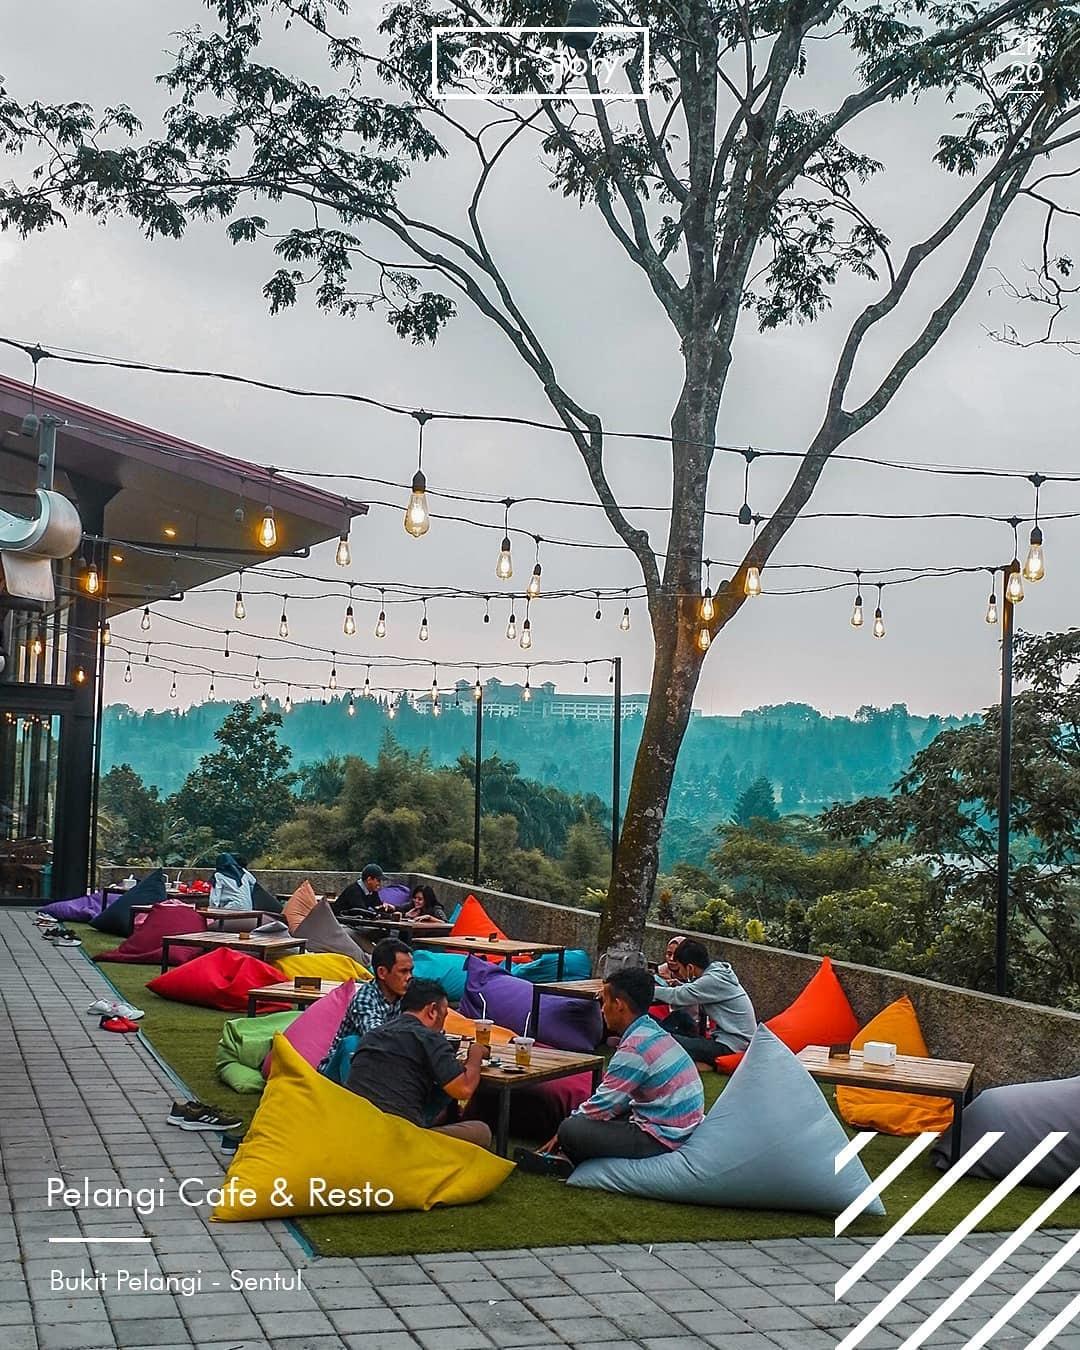 Harga Menu Pelangi Cafe Bogor